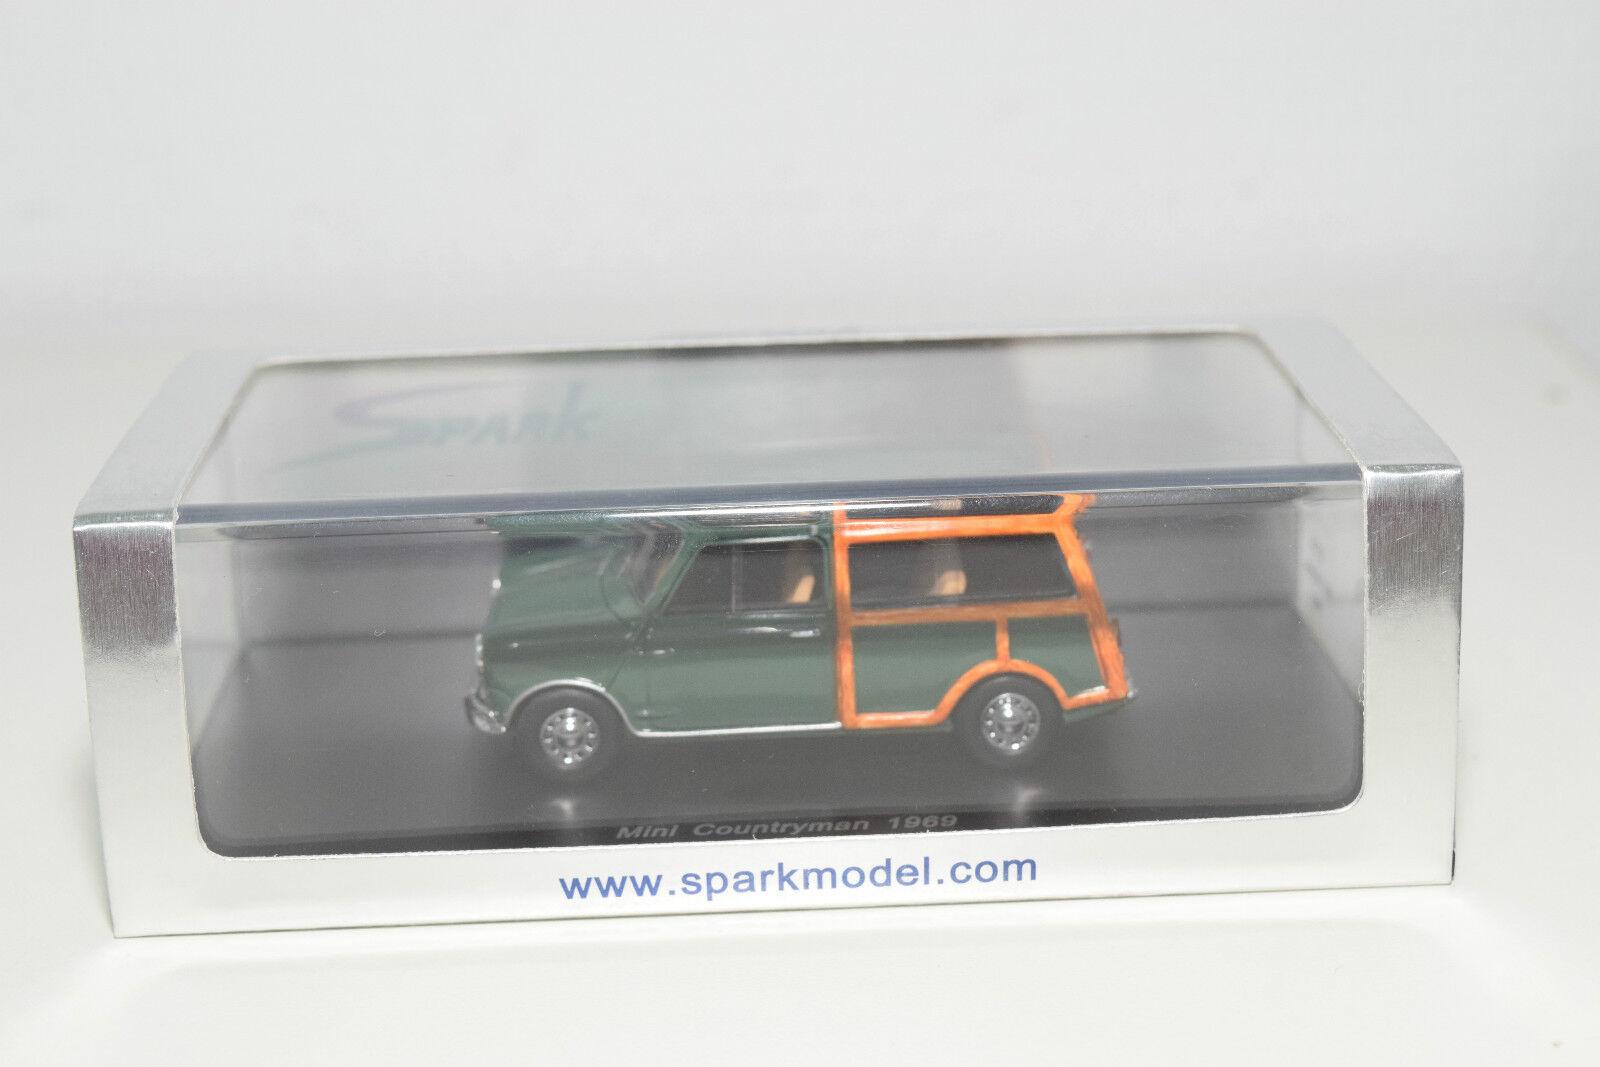 . . . SPARK S1514 MINI COUNTRYMAN 1969 DARK GREEN MINT BOXED 0dfc89